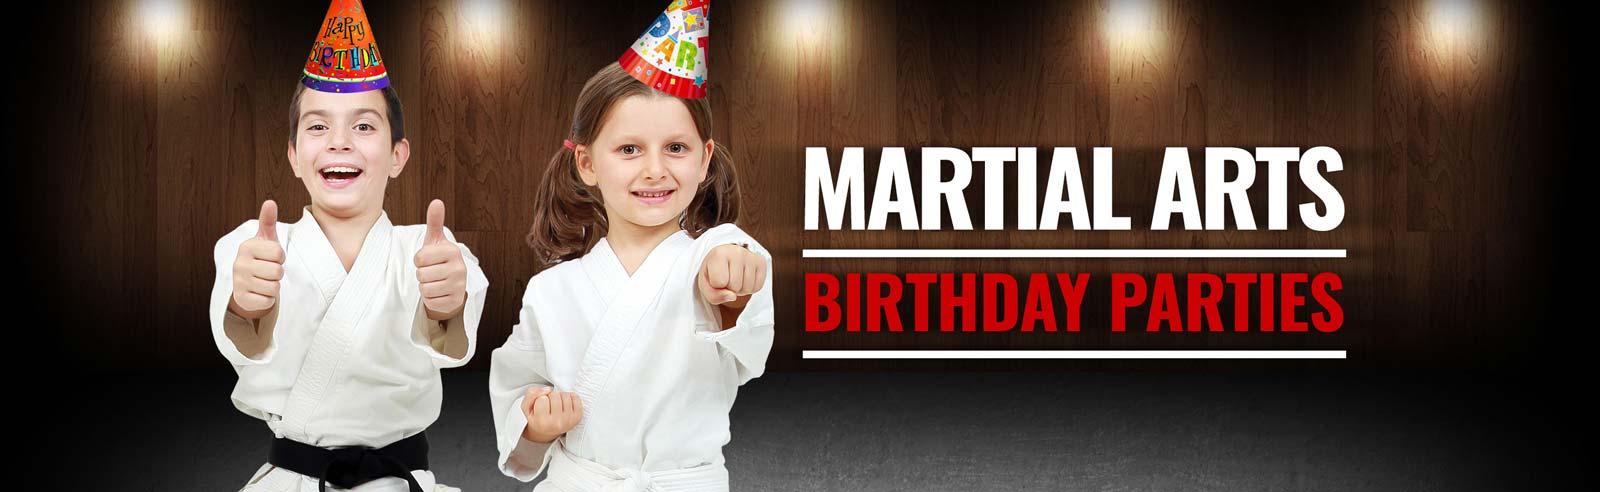 Karate for Kids | Karate Classes & Club Perth | Martial Arts